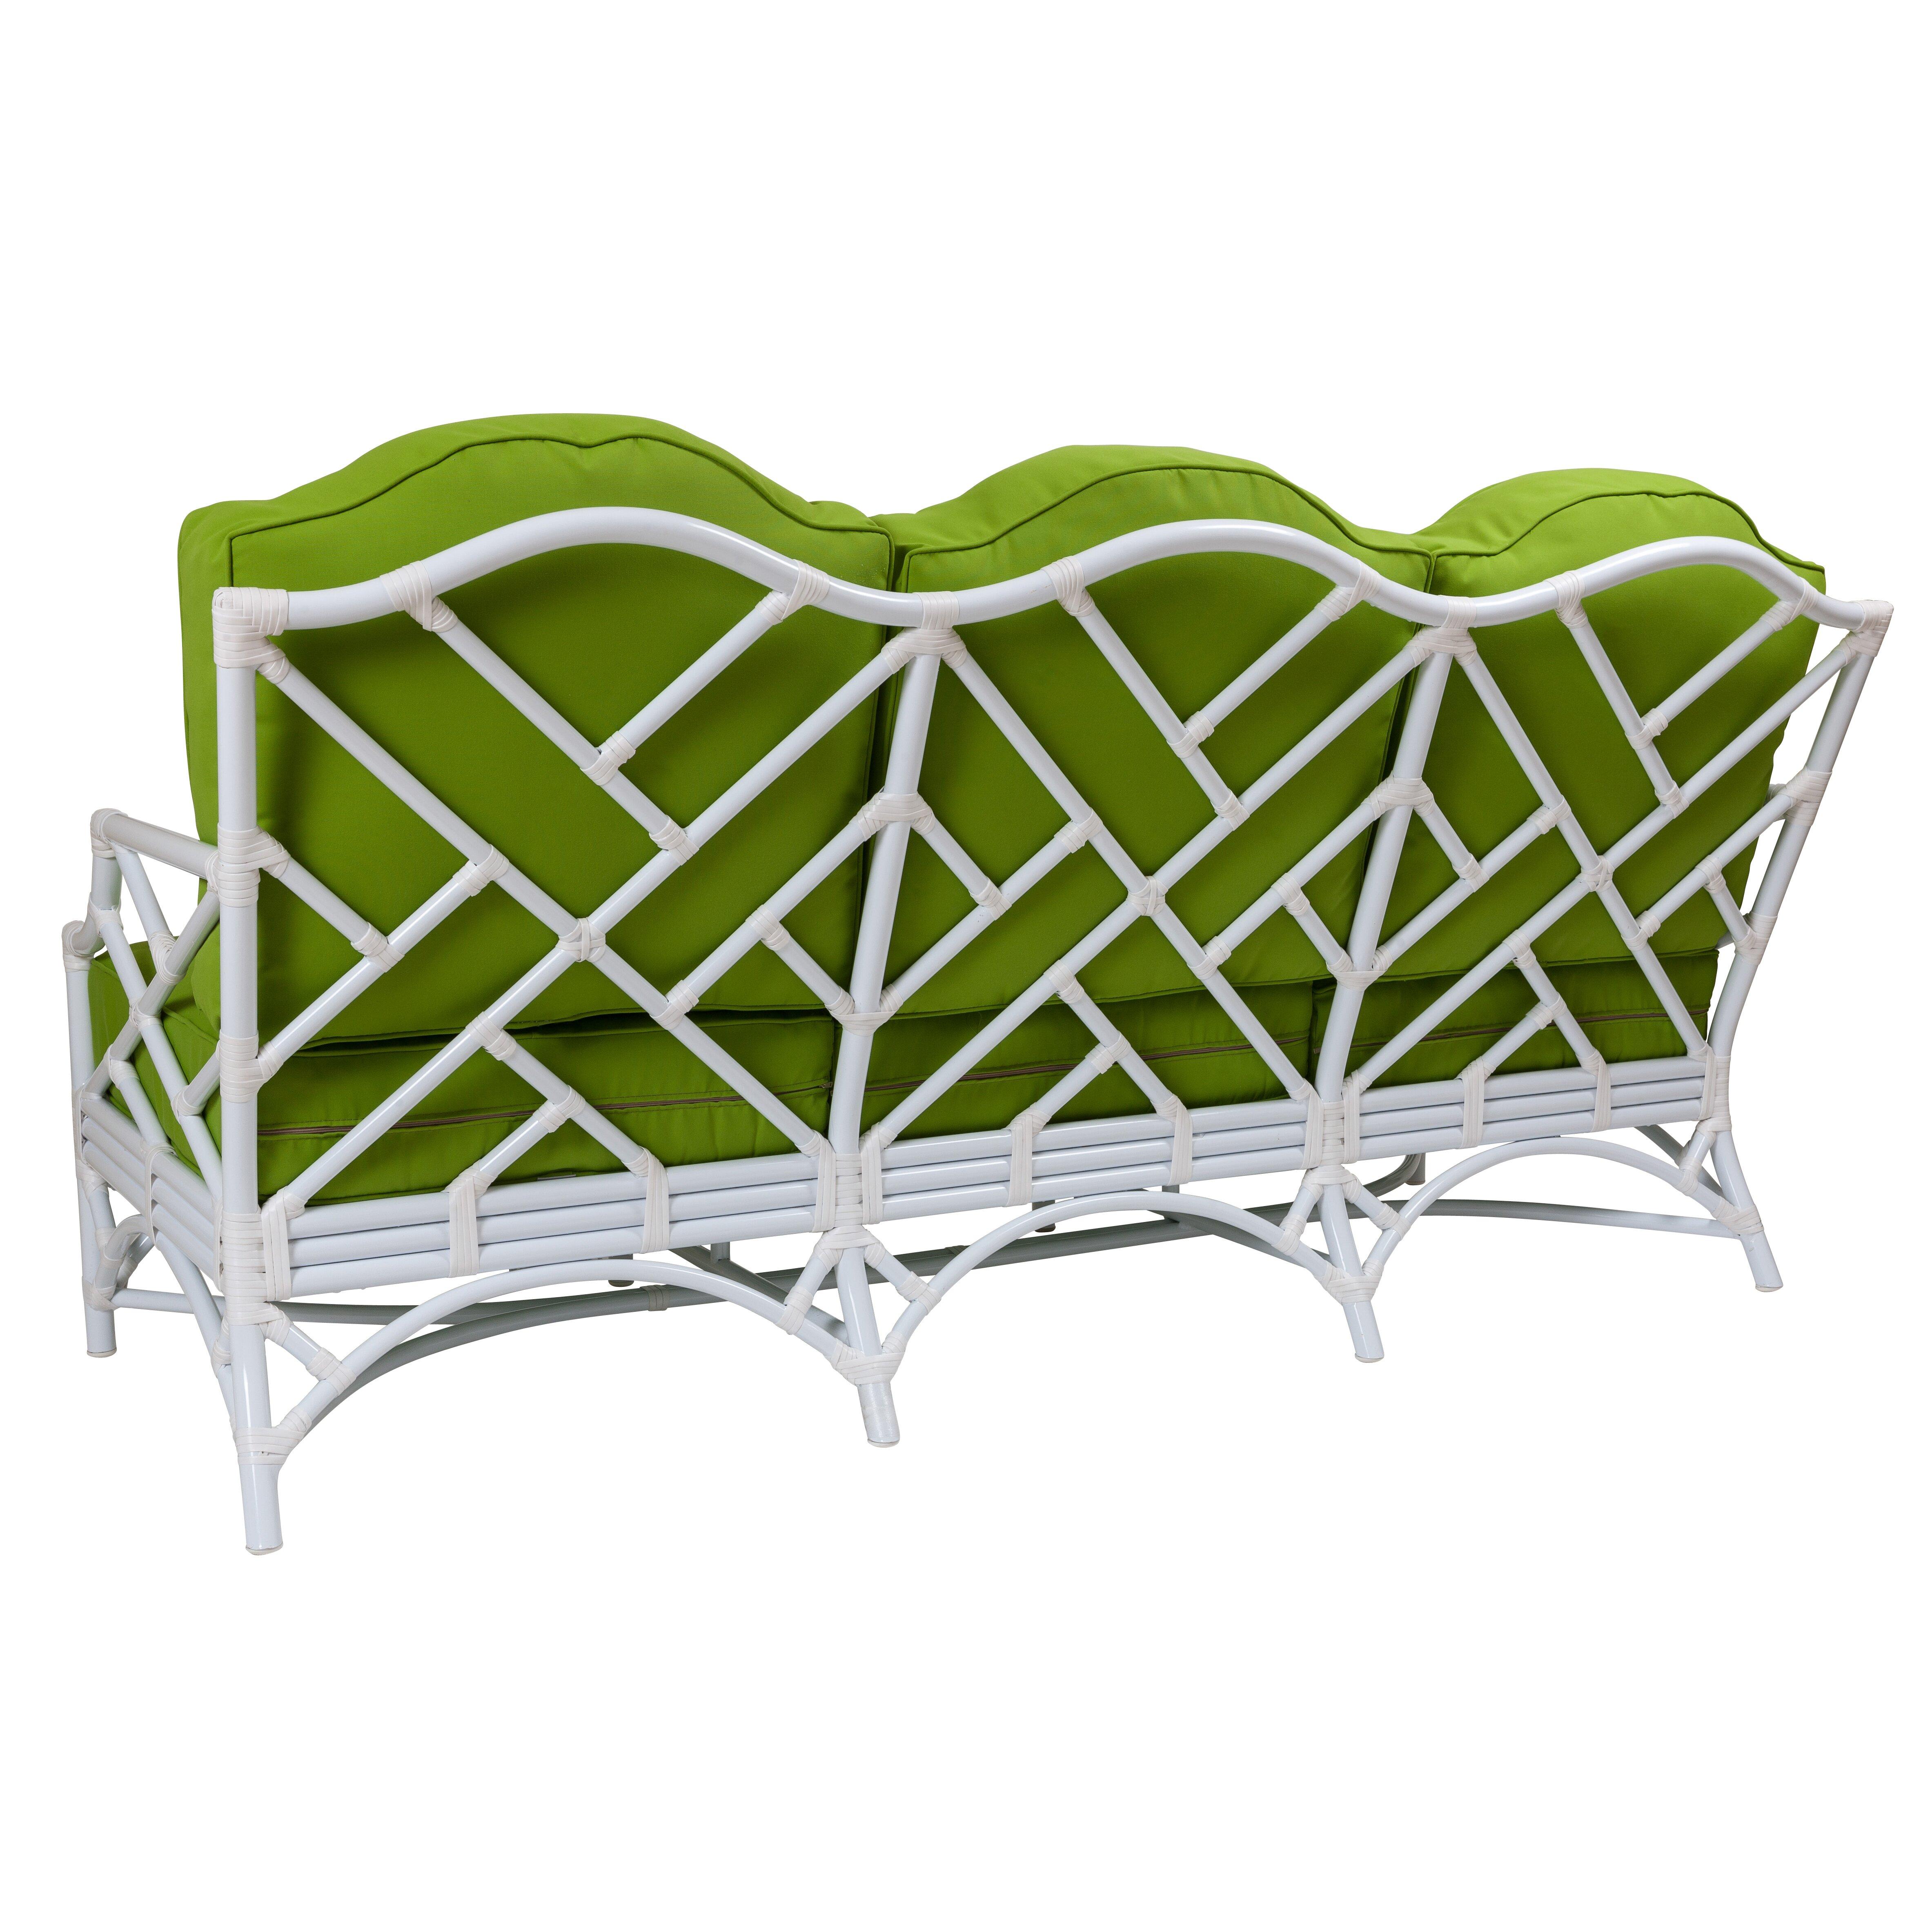 chippendale sofa  sofa menzilperdenet - david francis furniture chippendale sofa with cushions wayfair